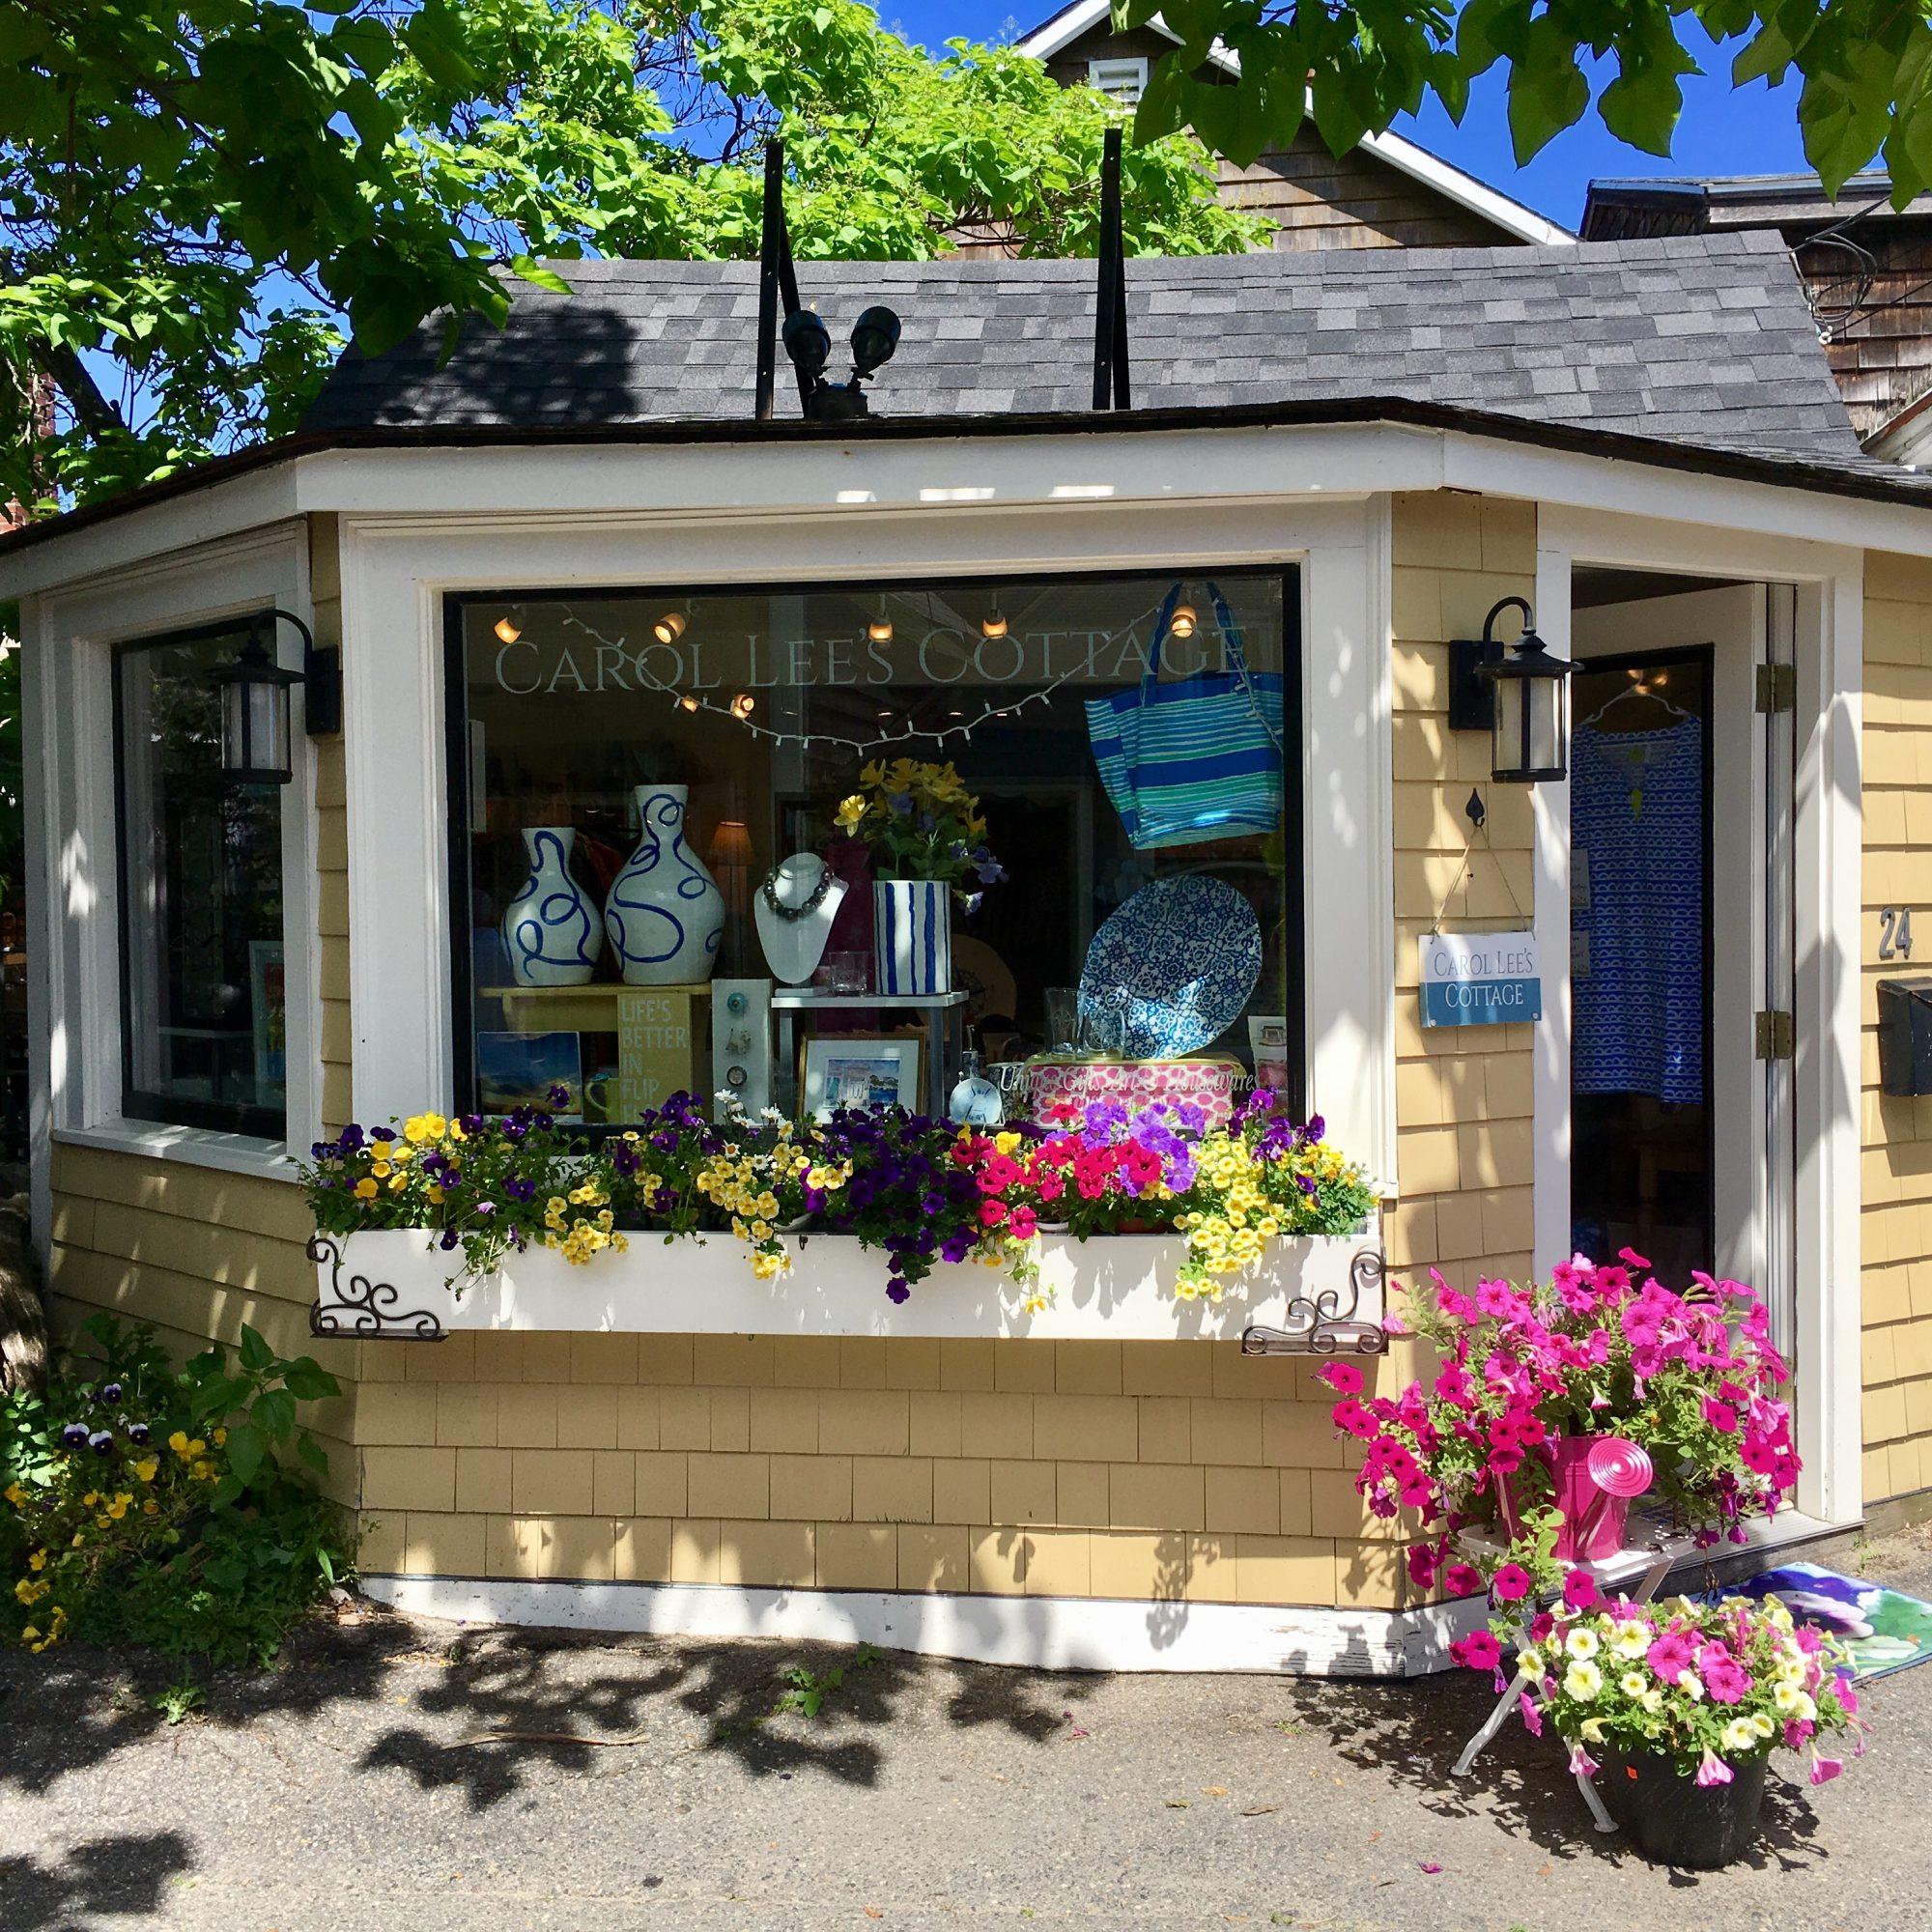 Boston Voyager Interviewed Local Shop Owner Carol Lee Kelliher